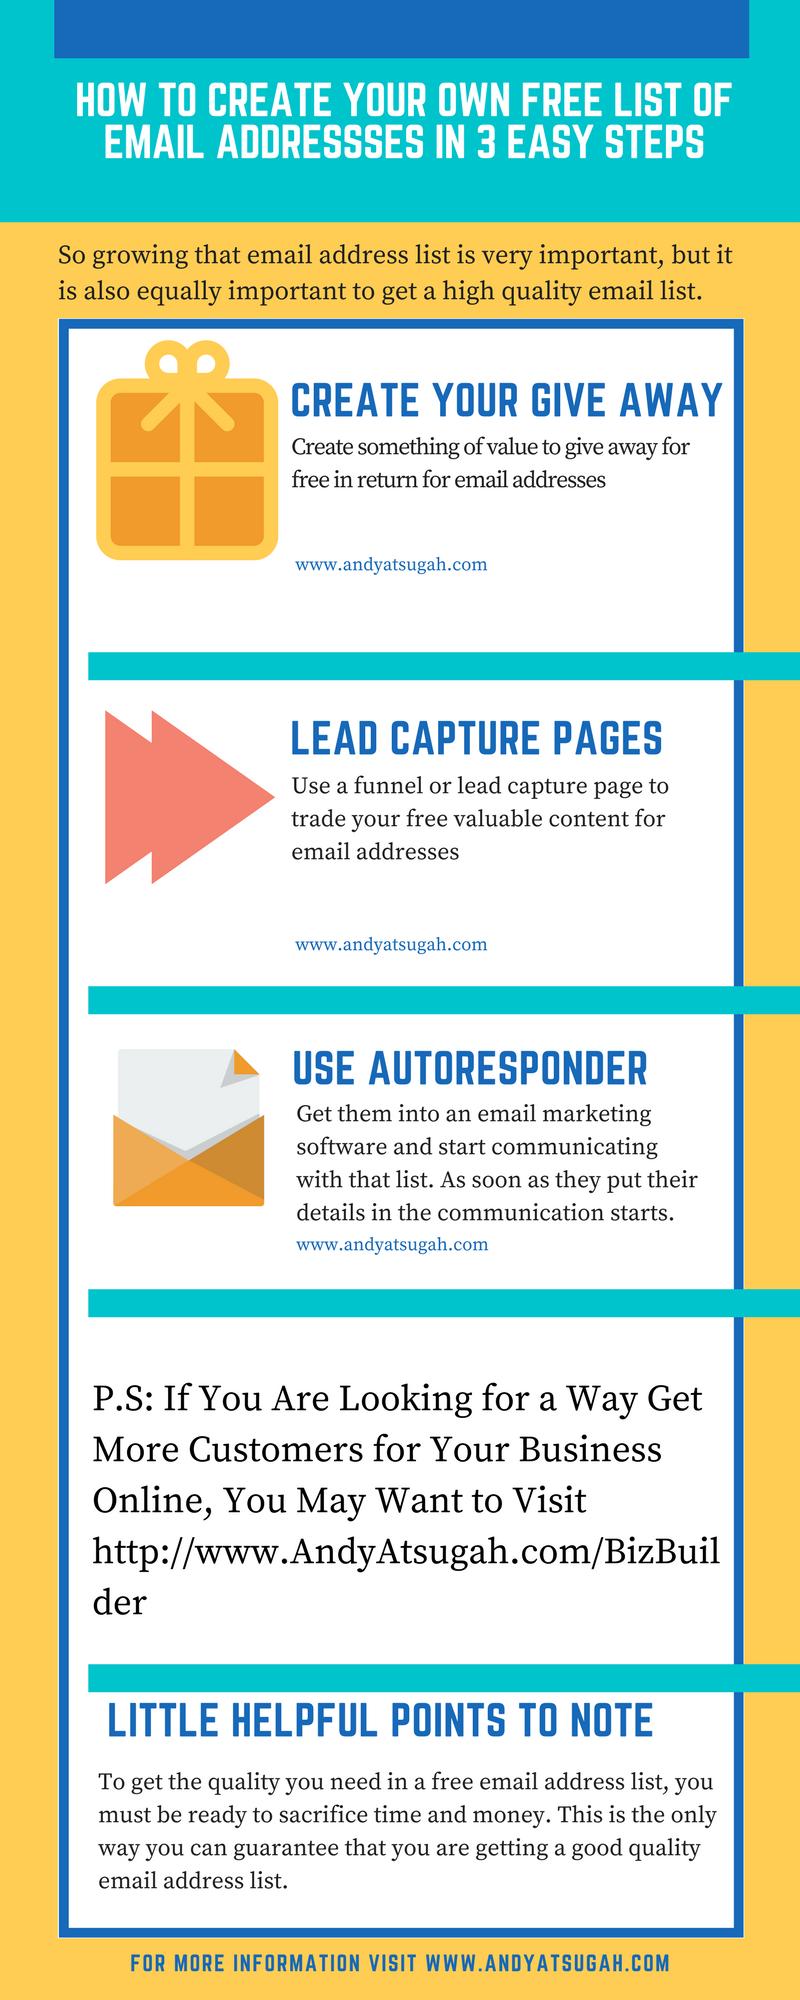 Free list of email addresses - Free Email Addressblog